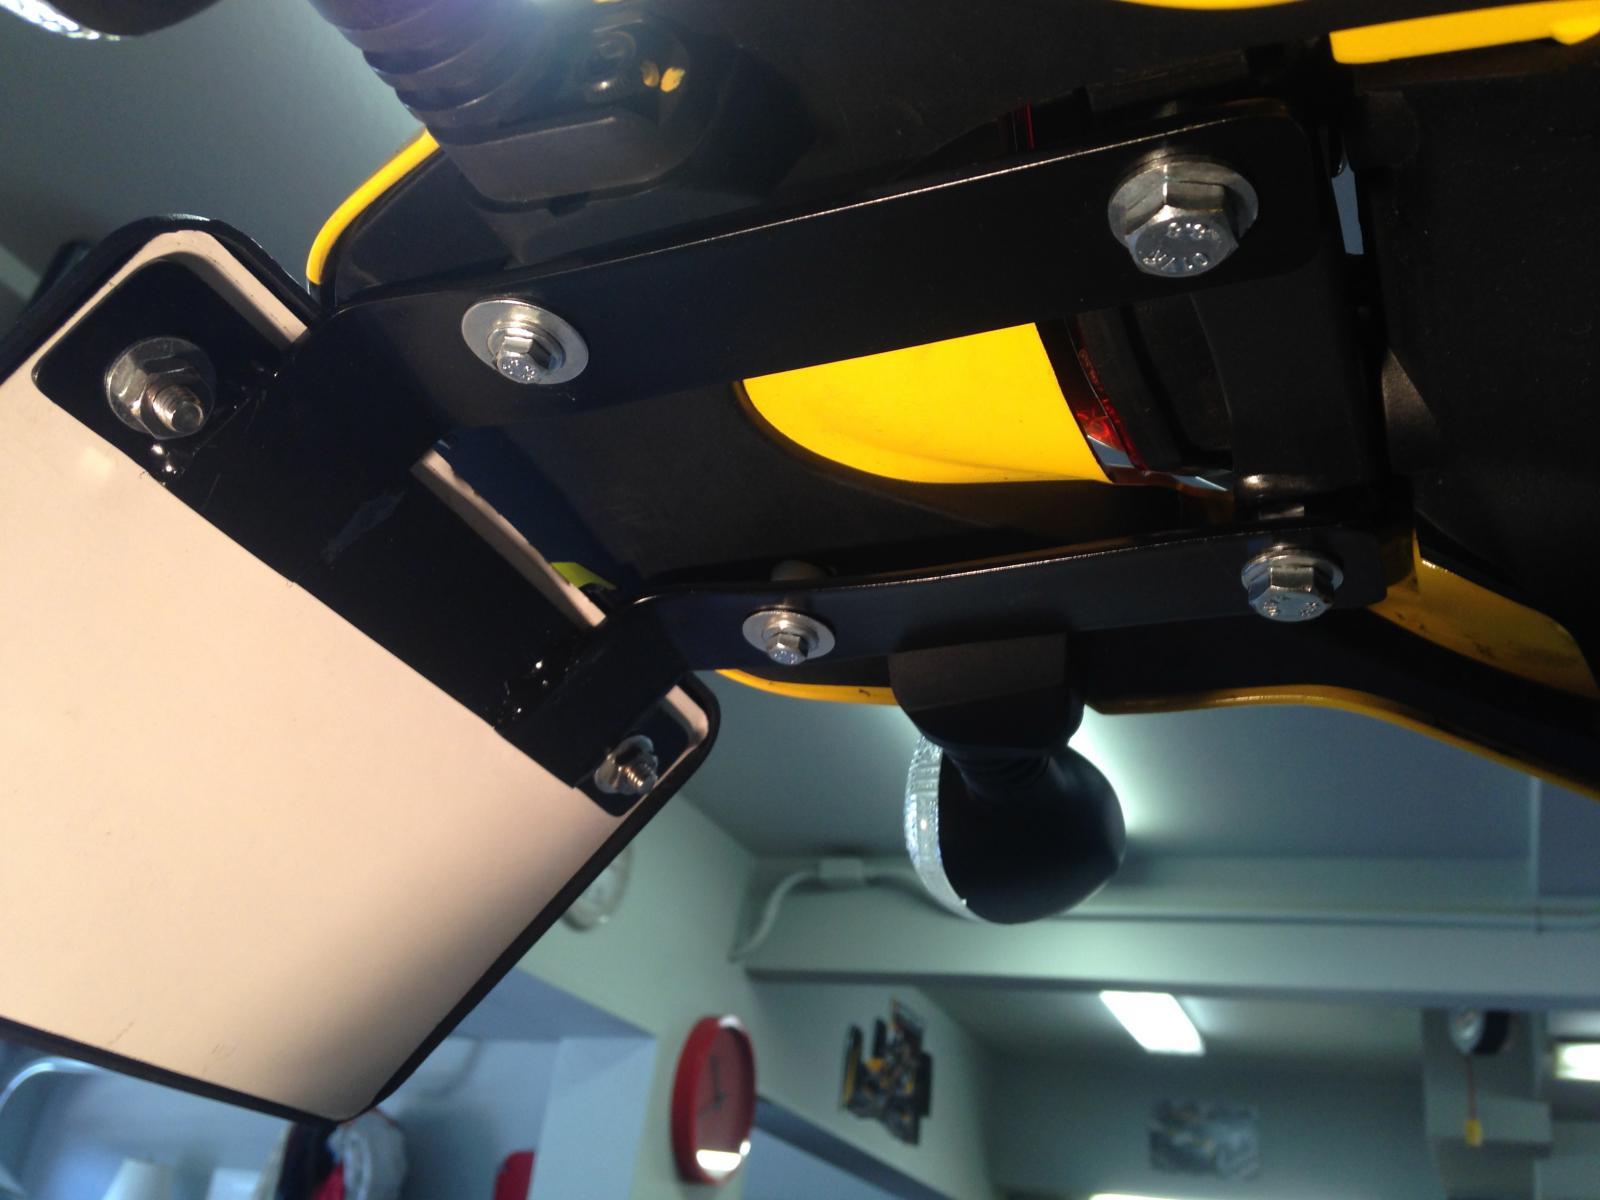 Ducati Scrambler Forum - View Single Post - Tail tidy options??